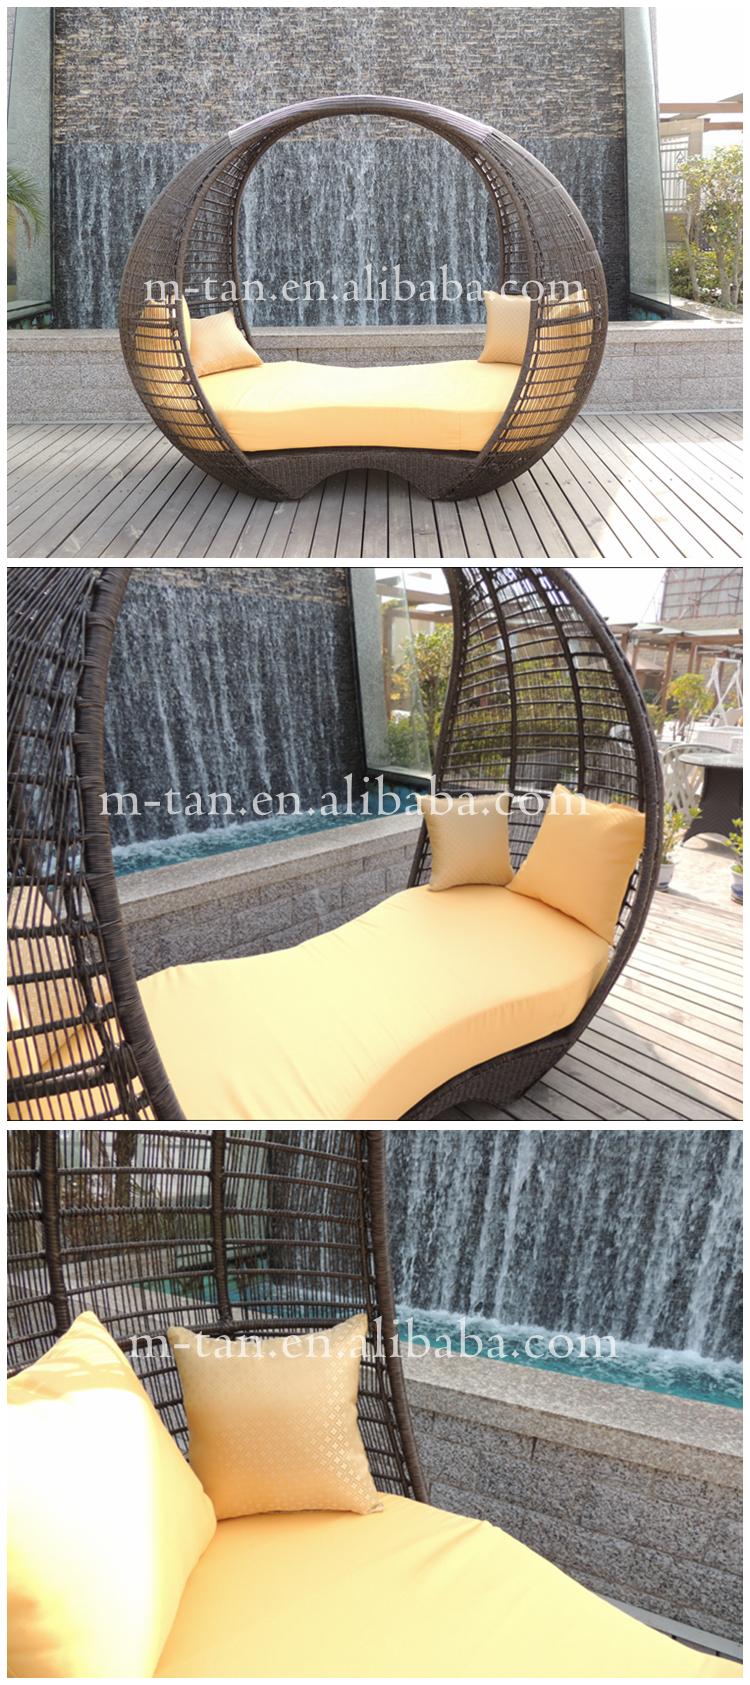 China Großhandel Moderne Große Alibaba Wicker Rattan Outdoor Lounge Möbel  Kokon